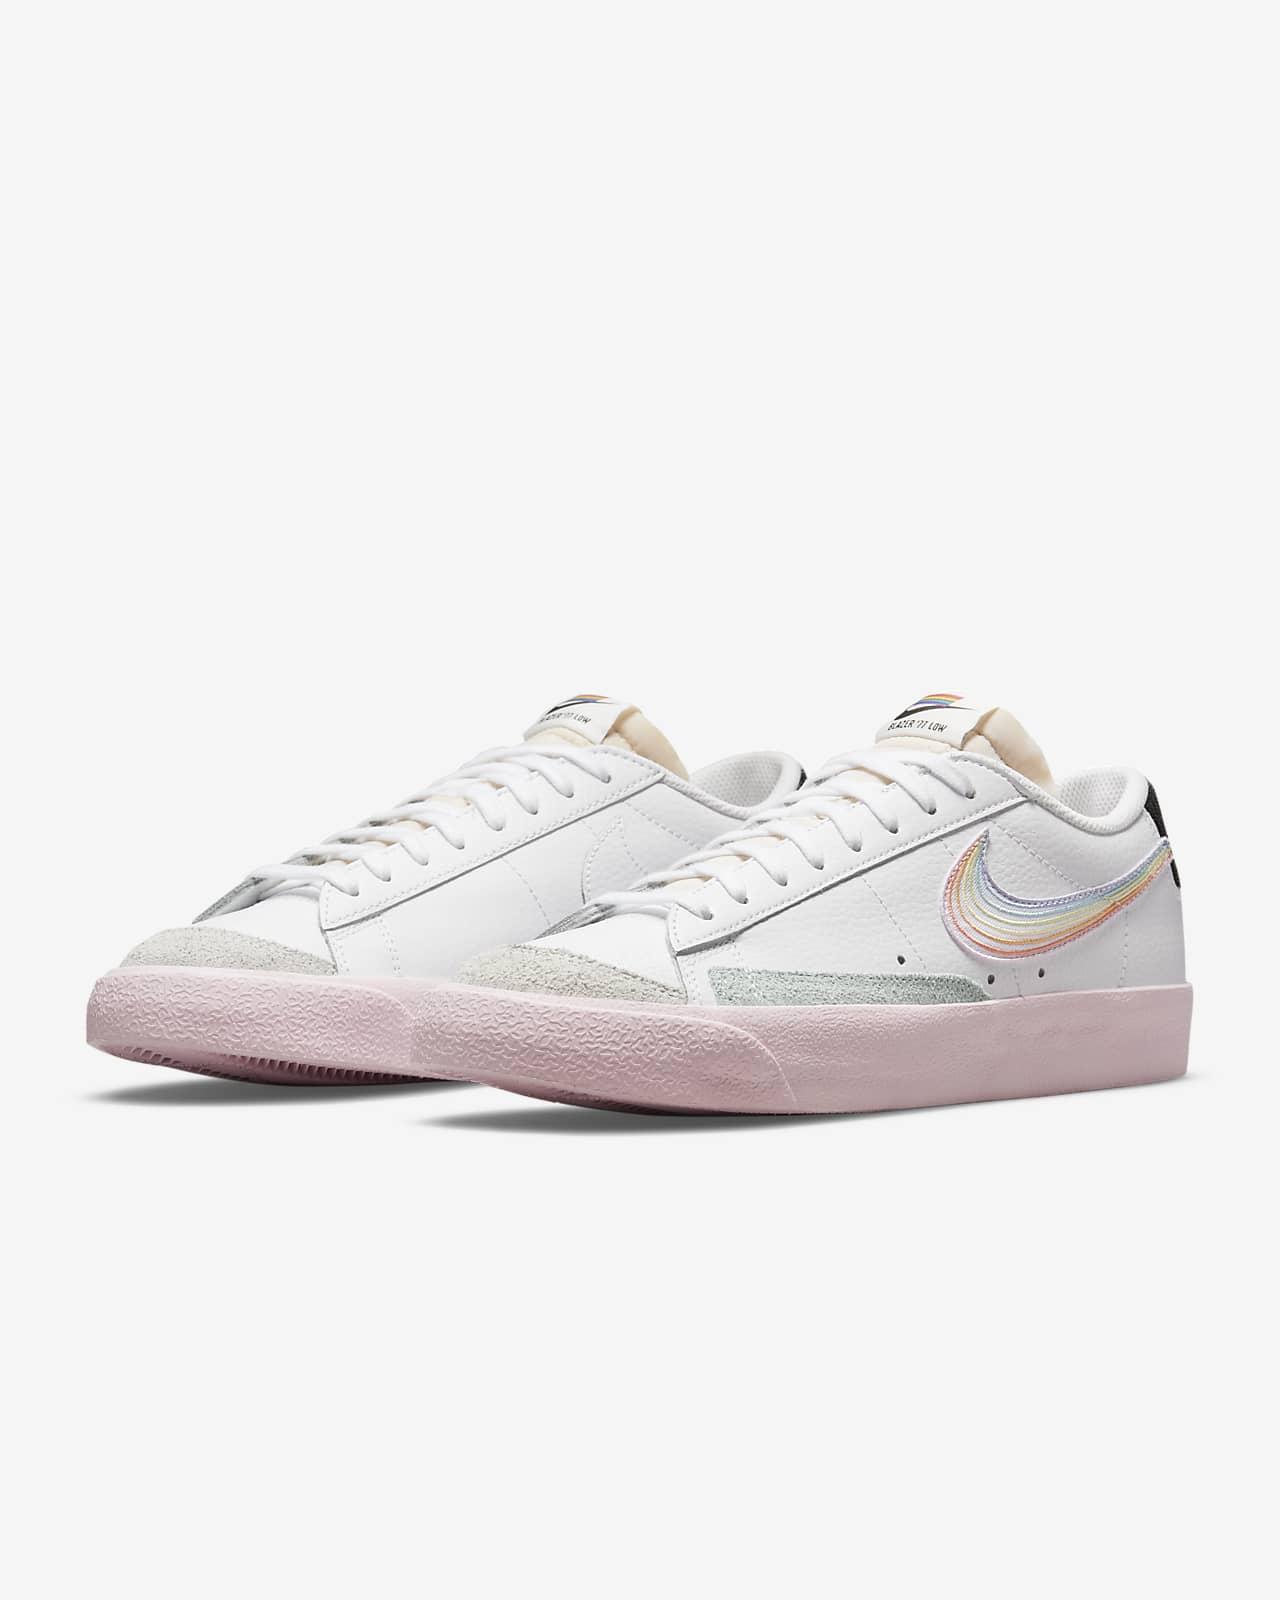 Nike Blazer Low '77 Vintage BeTrue Shoes